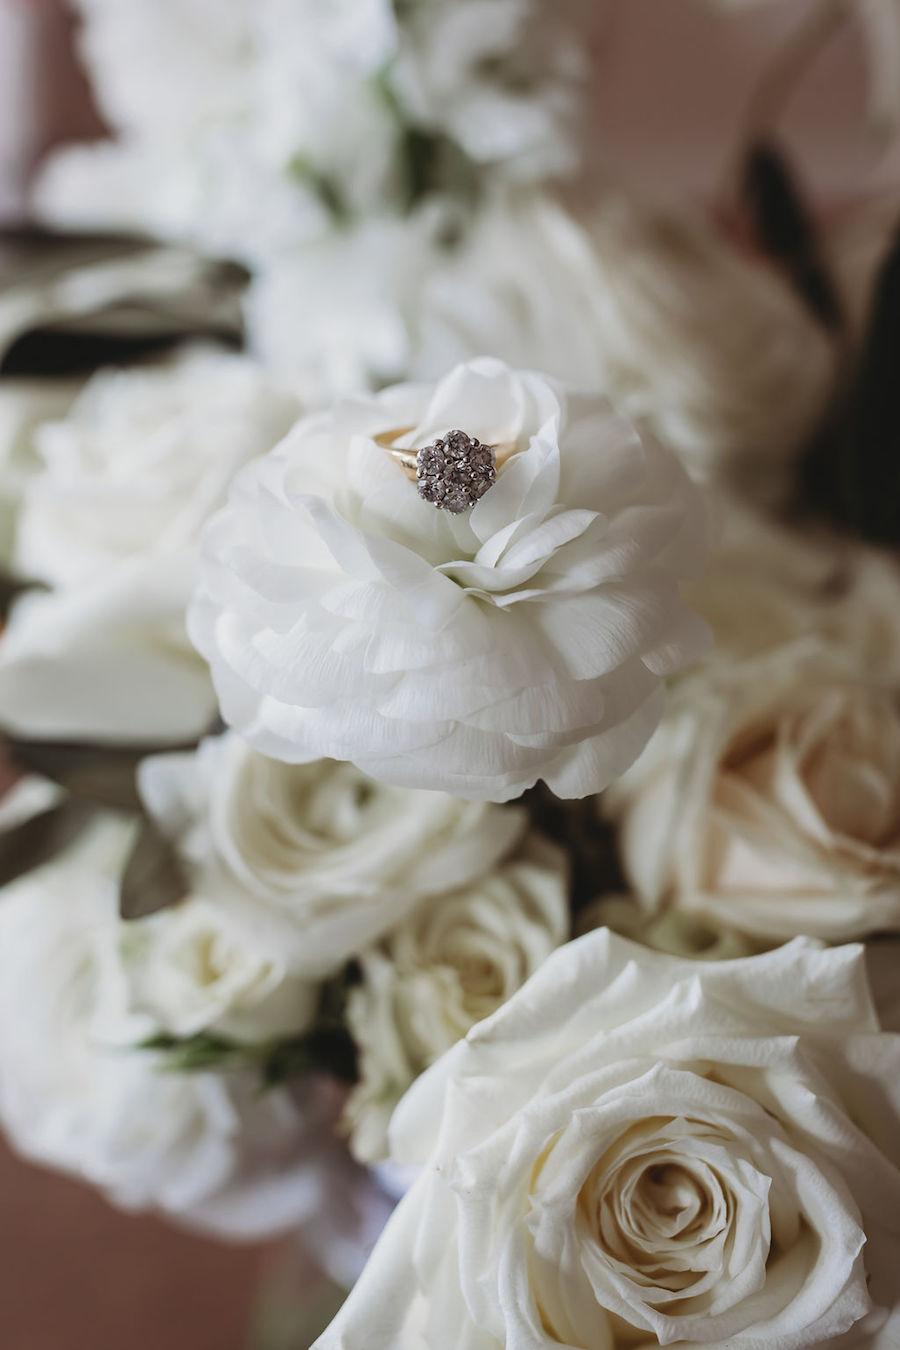 tweed-coast-weddings-wedding-venue-osteria-casuarina-ceremony-reception-5T1A7591.jpg